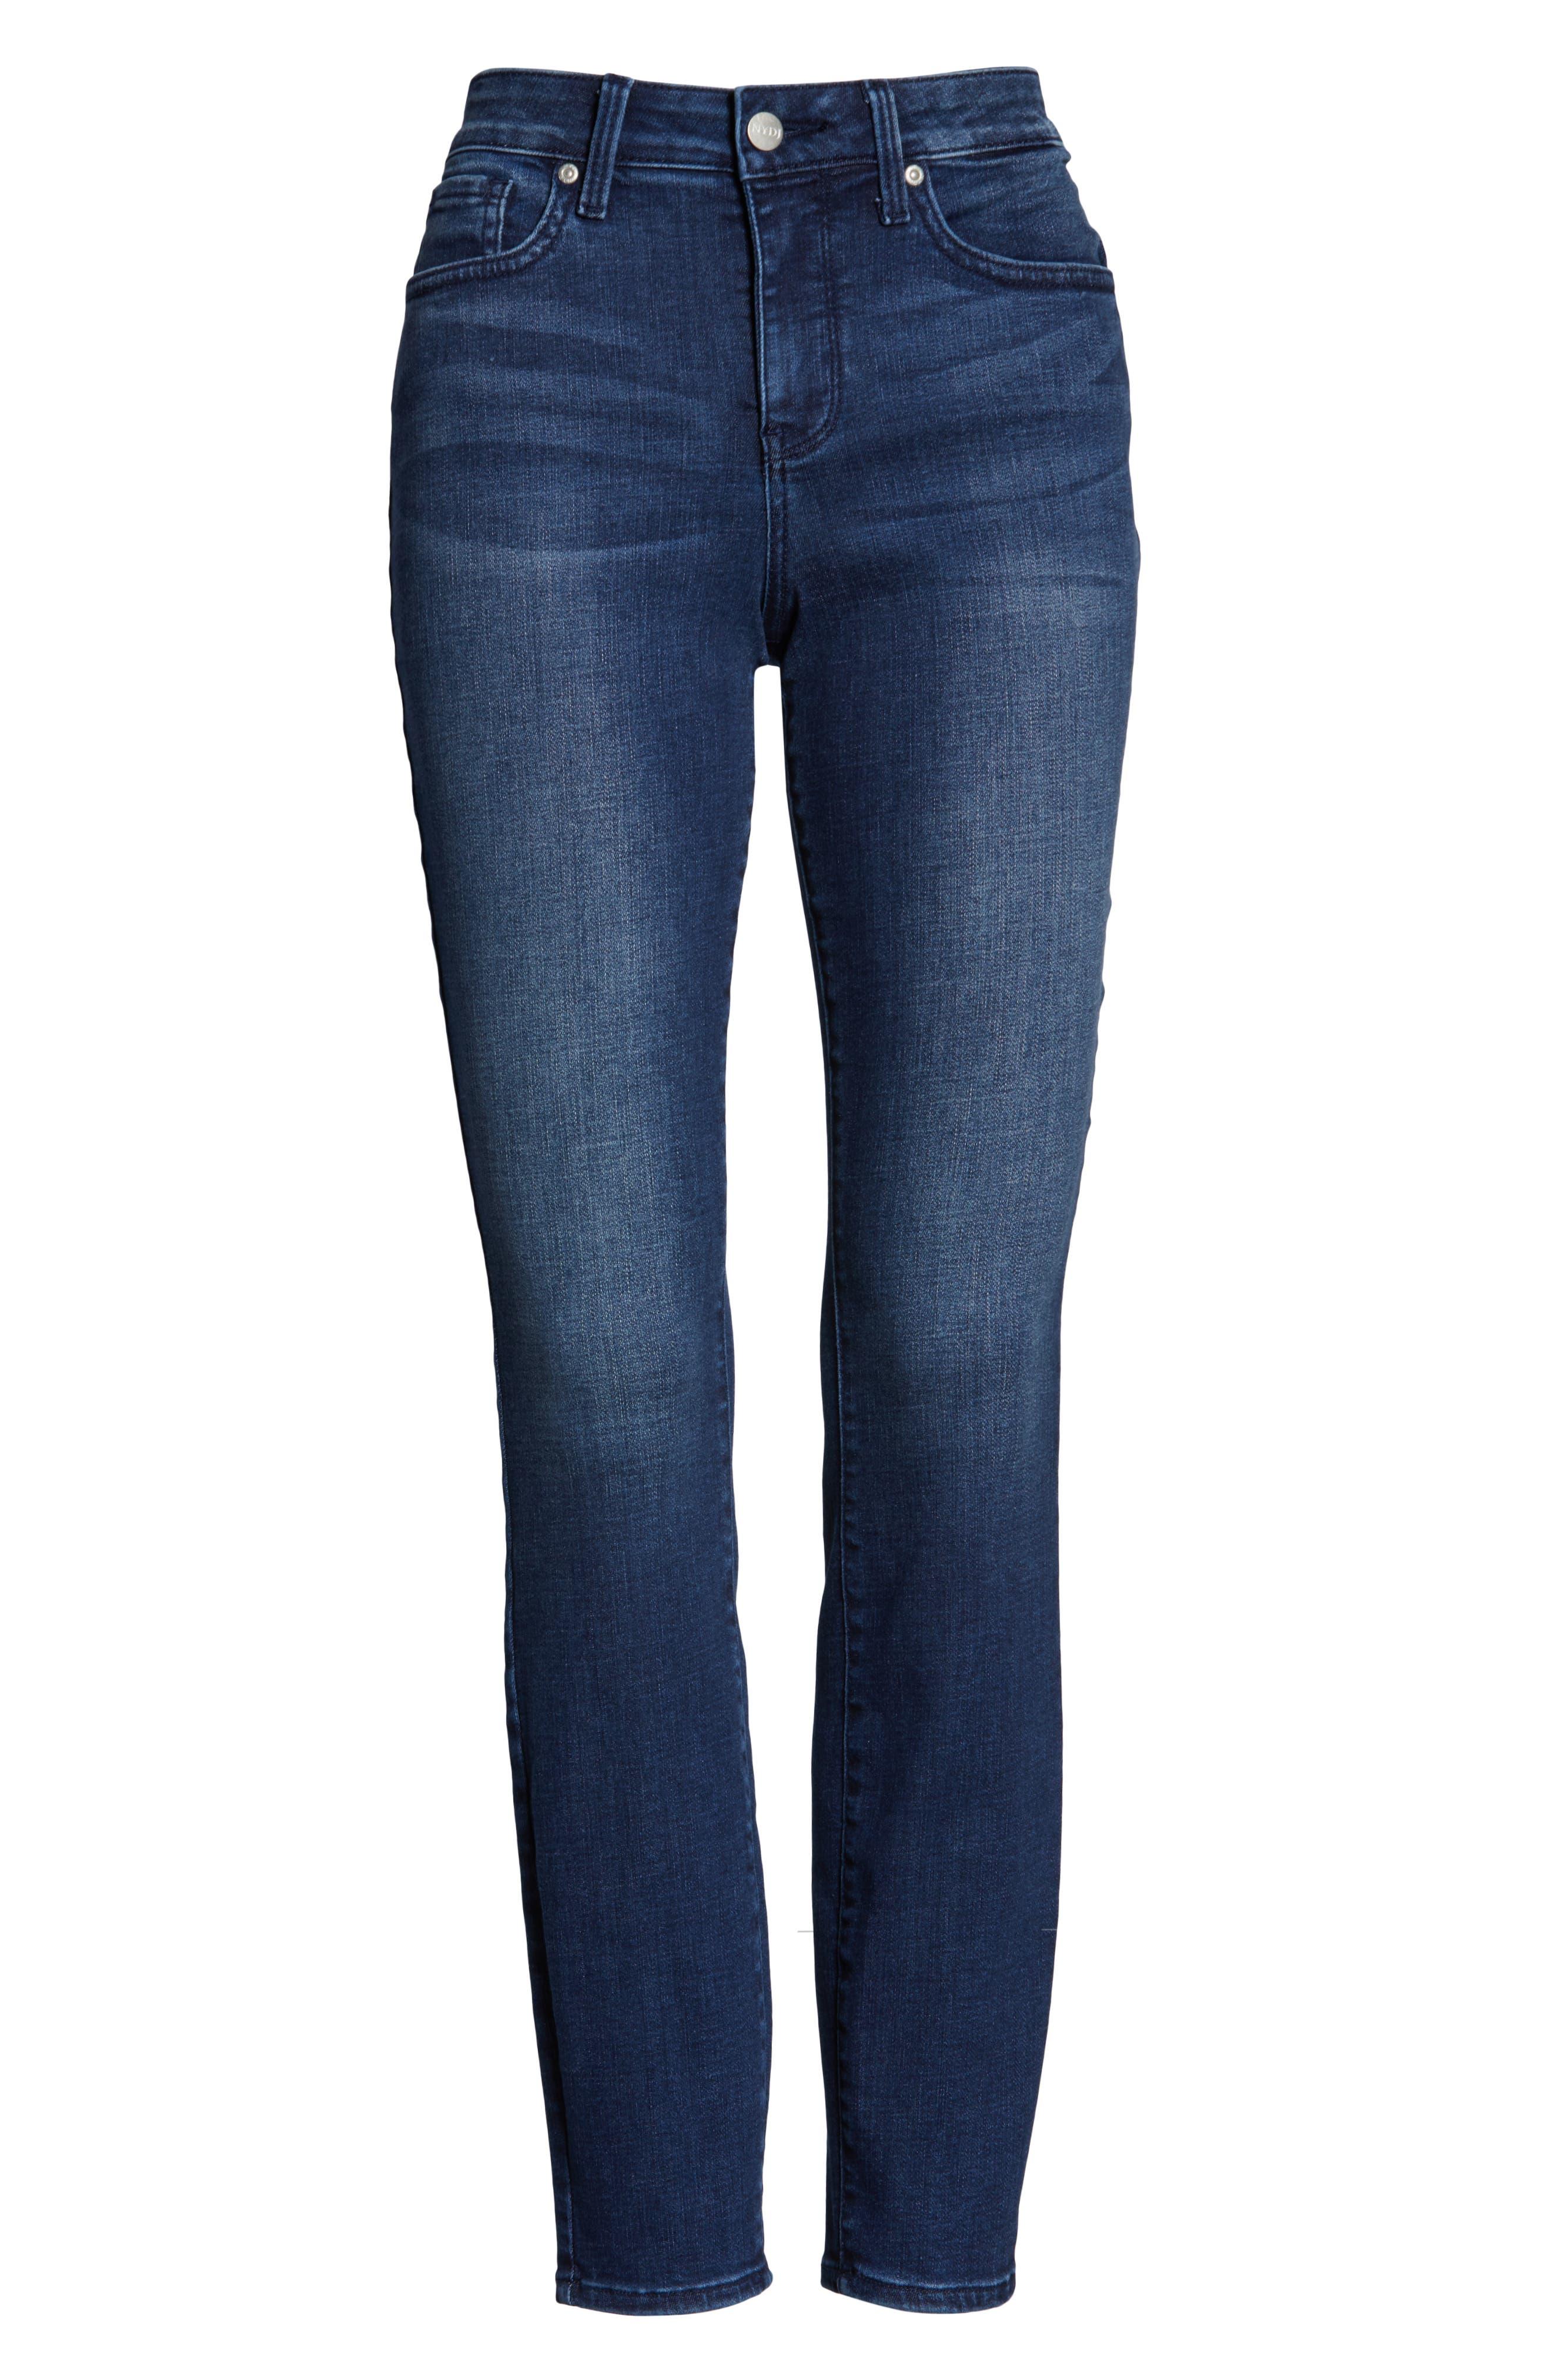 NYDJ, Ami Ankle Skinny Jeans, Alternate thumbnail 5, color, REGO